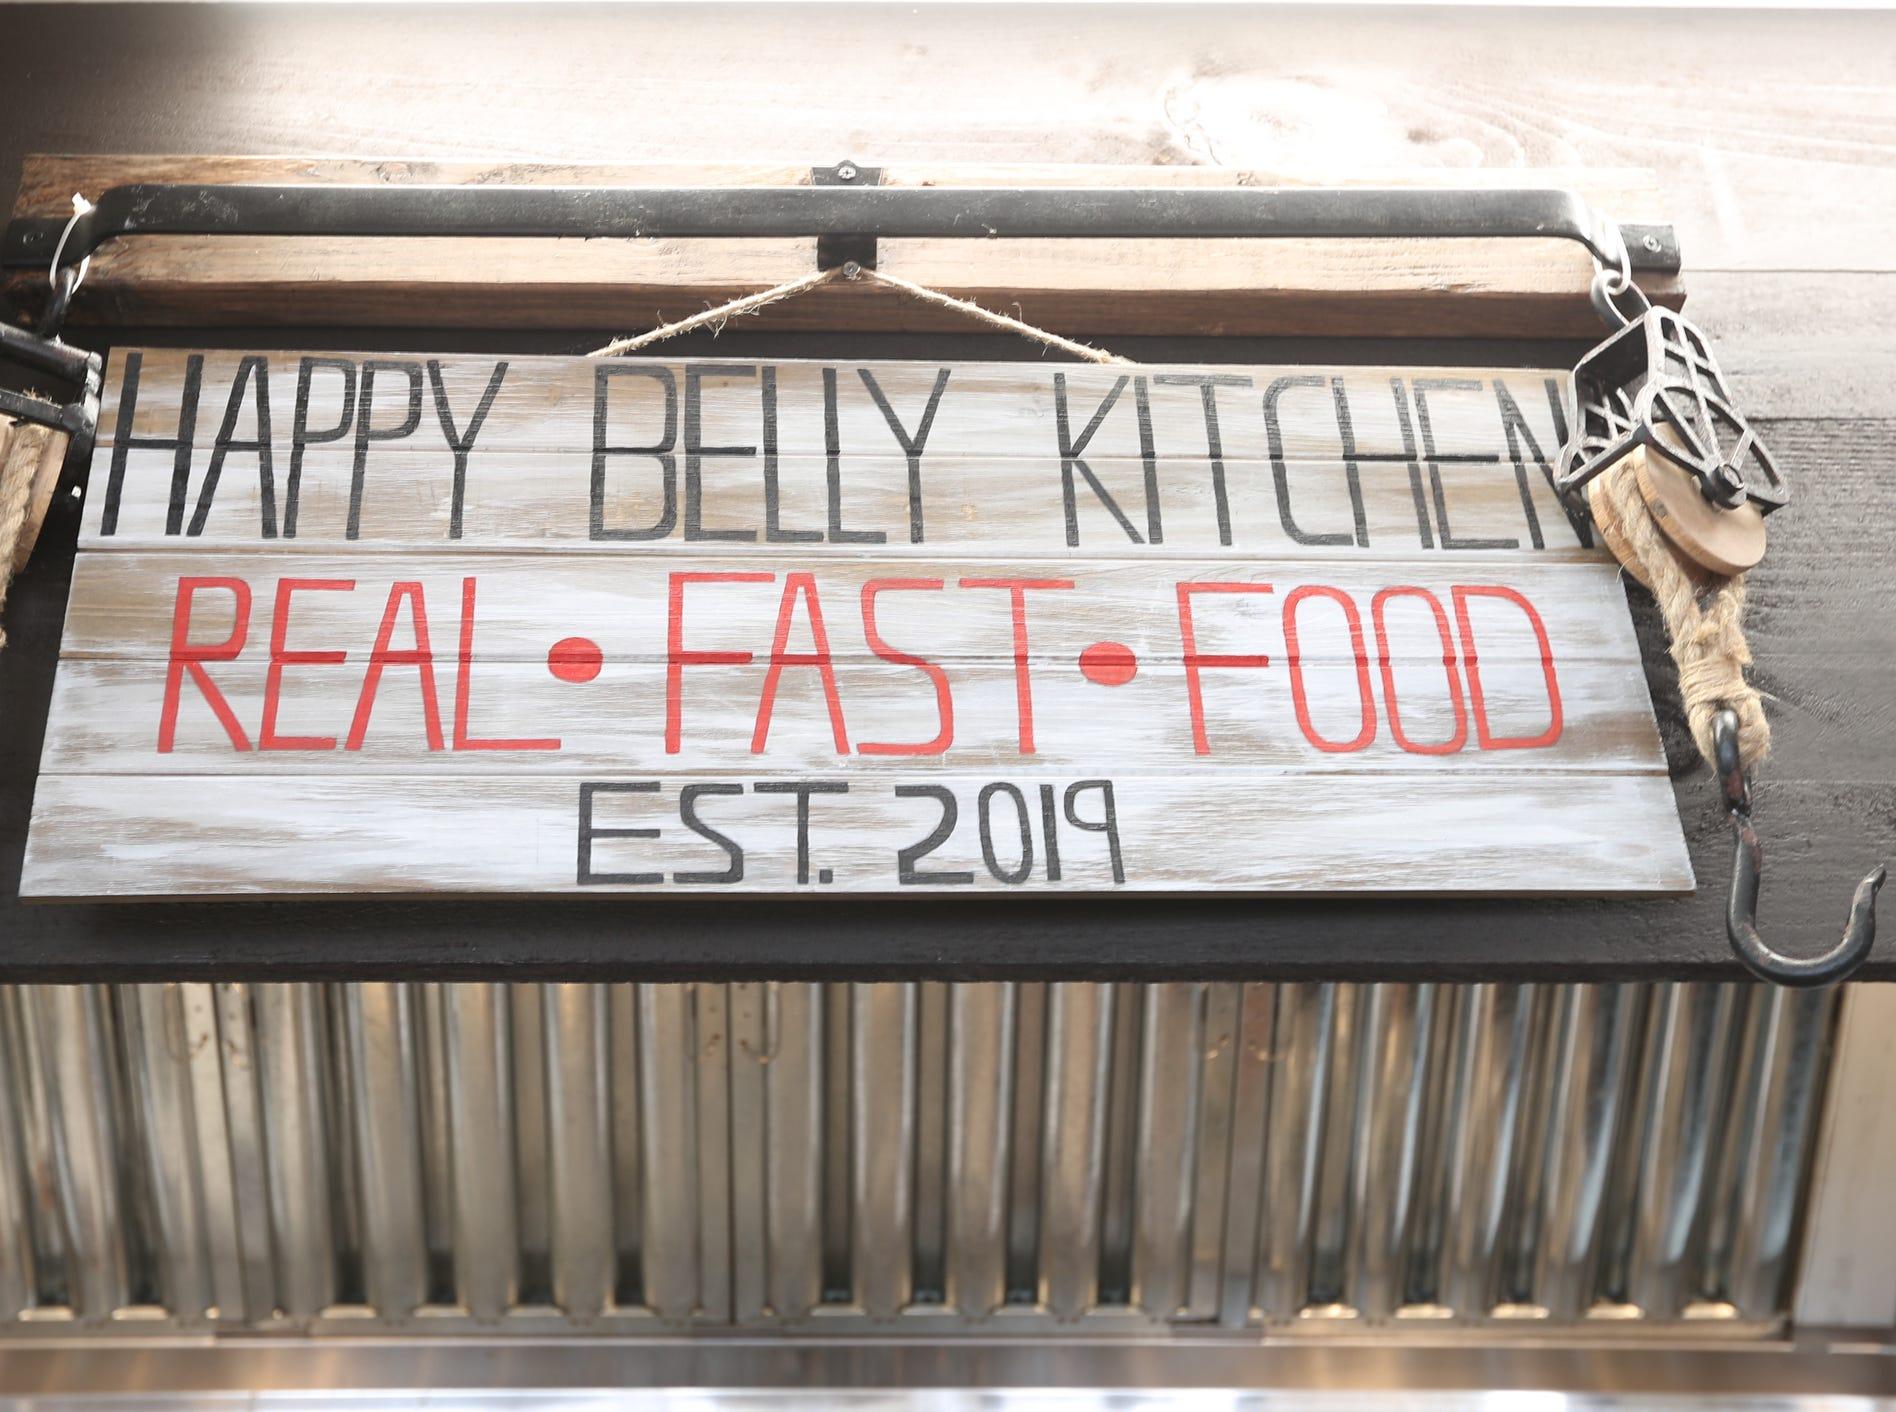 Happy Belly Kitchen in Sloatsburg on Wednesday, February 13, 2019.